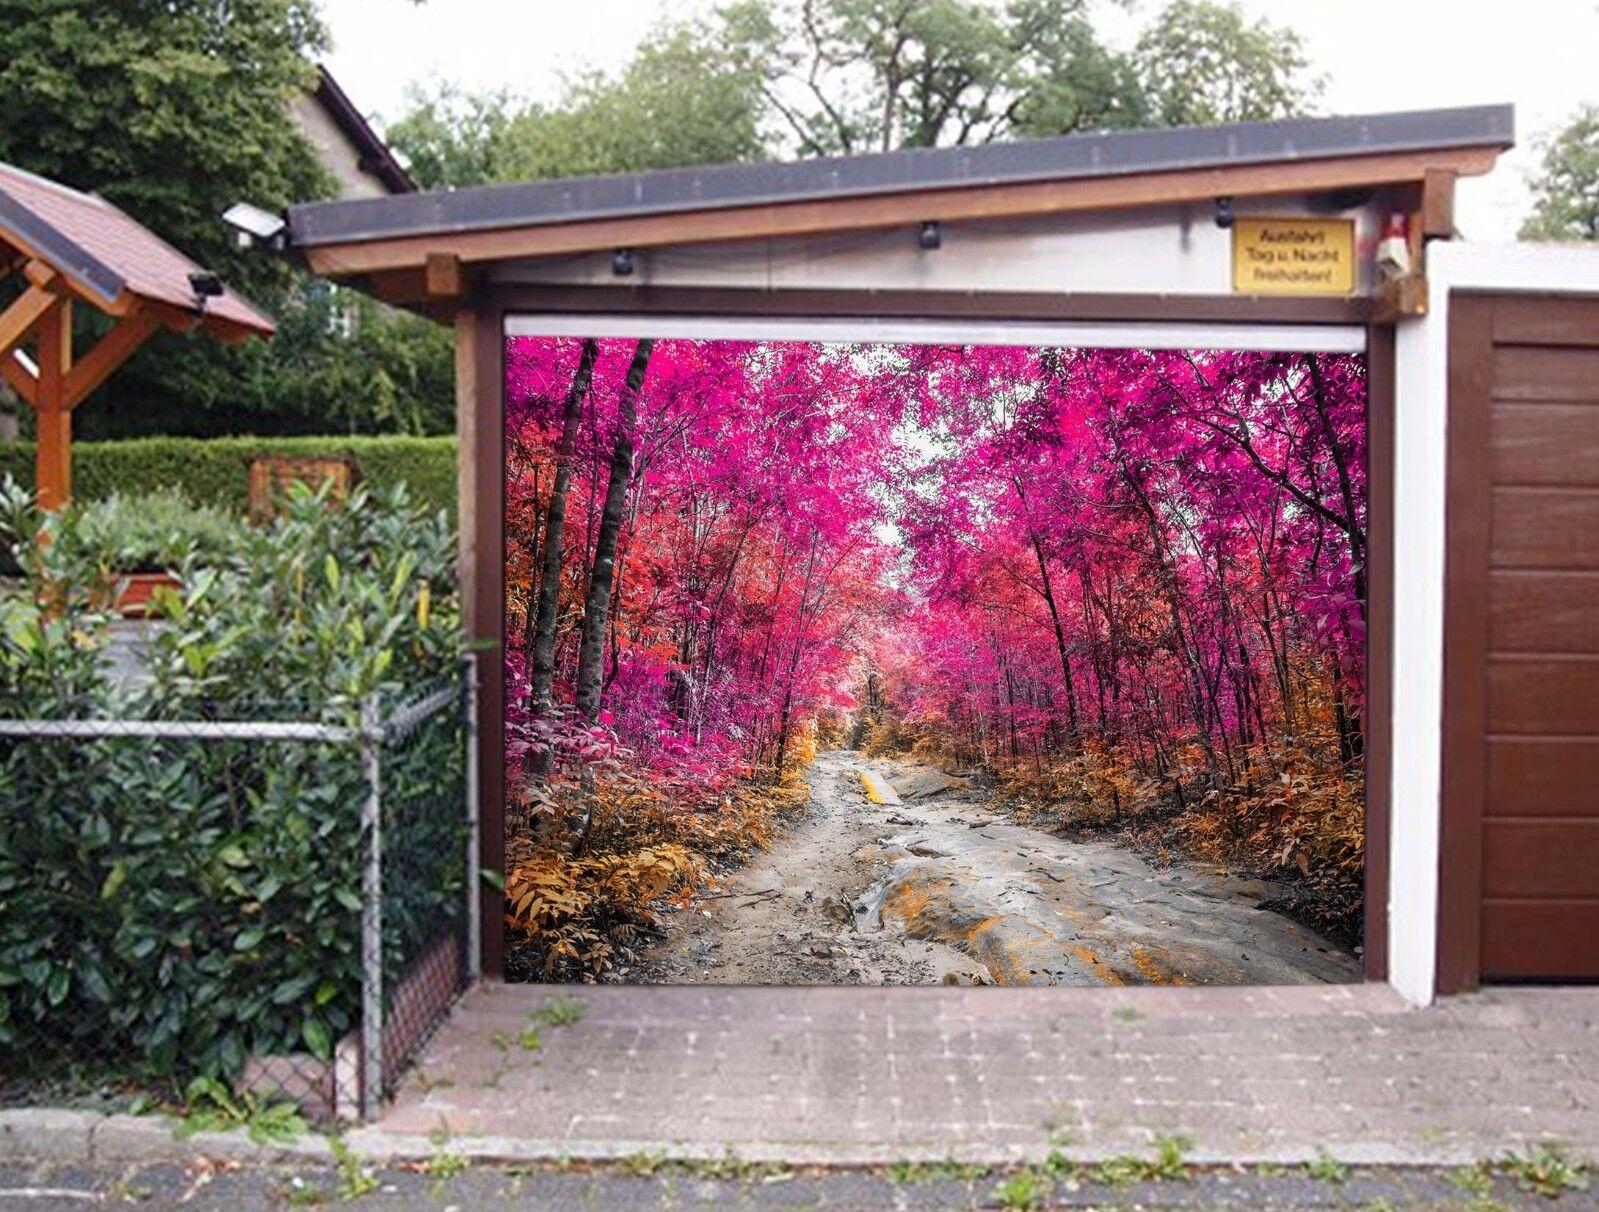 3D 3D 3D Rojo maderas Puerta De Garaje Impresión De Pared Calcomanía Pared Murales Wallpaper Deco AJ Reino Unido 79f13d